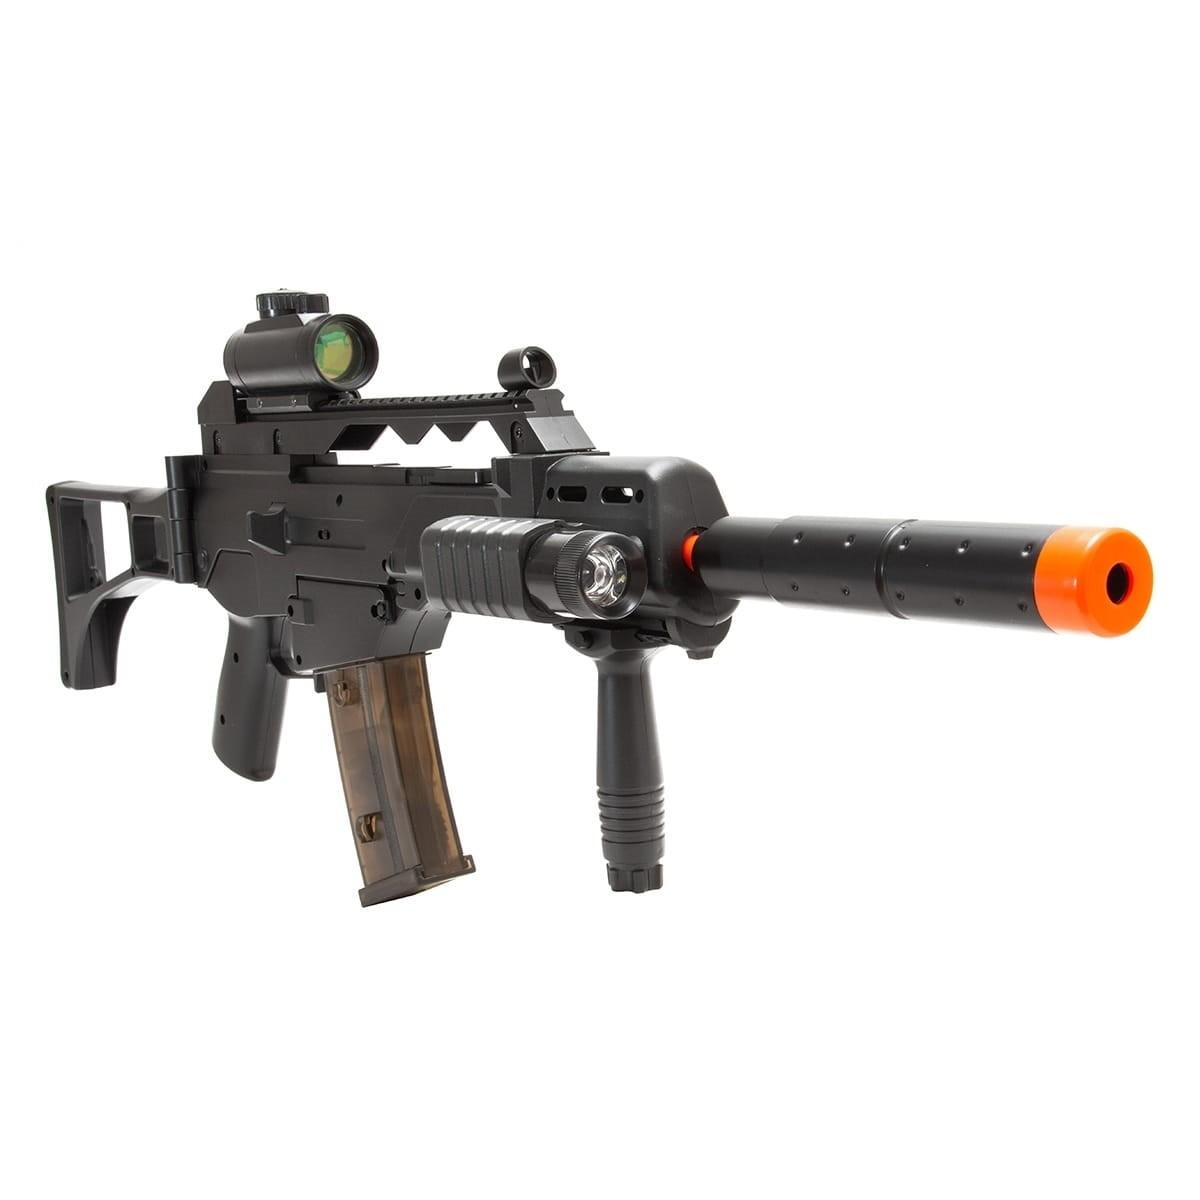 Rifle Airsoft Hk G36 Elétrico Bivolt 6mm Rajada + 1000 Bbs